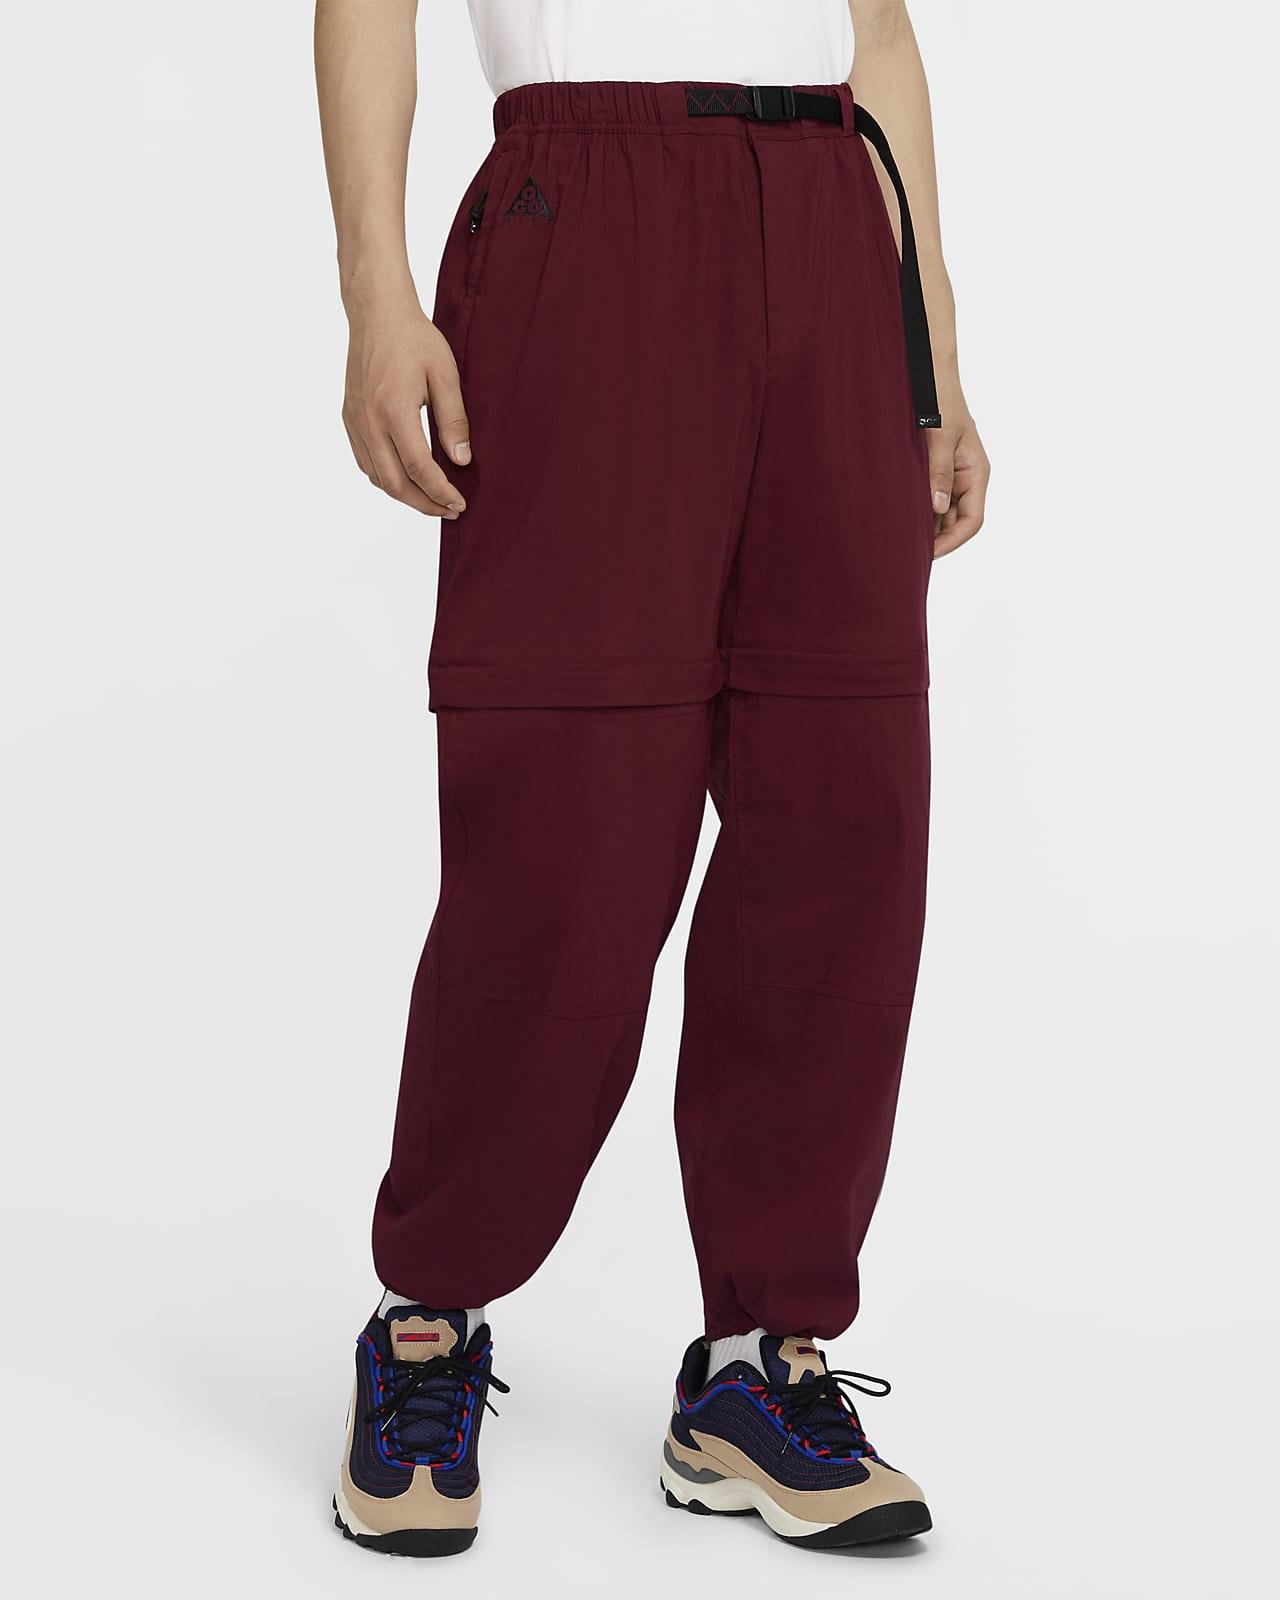 Nike ACG Men's Convertible Trousers